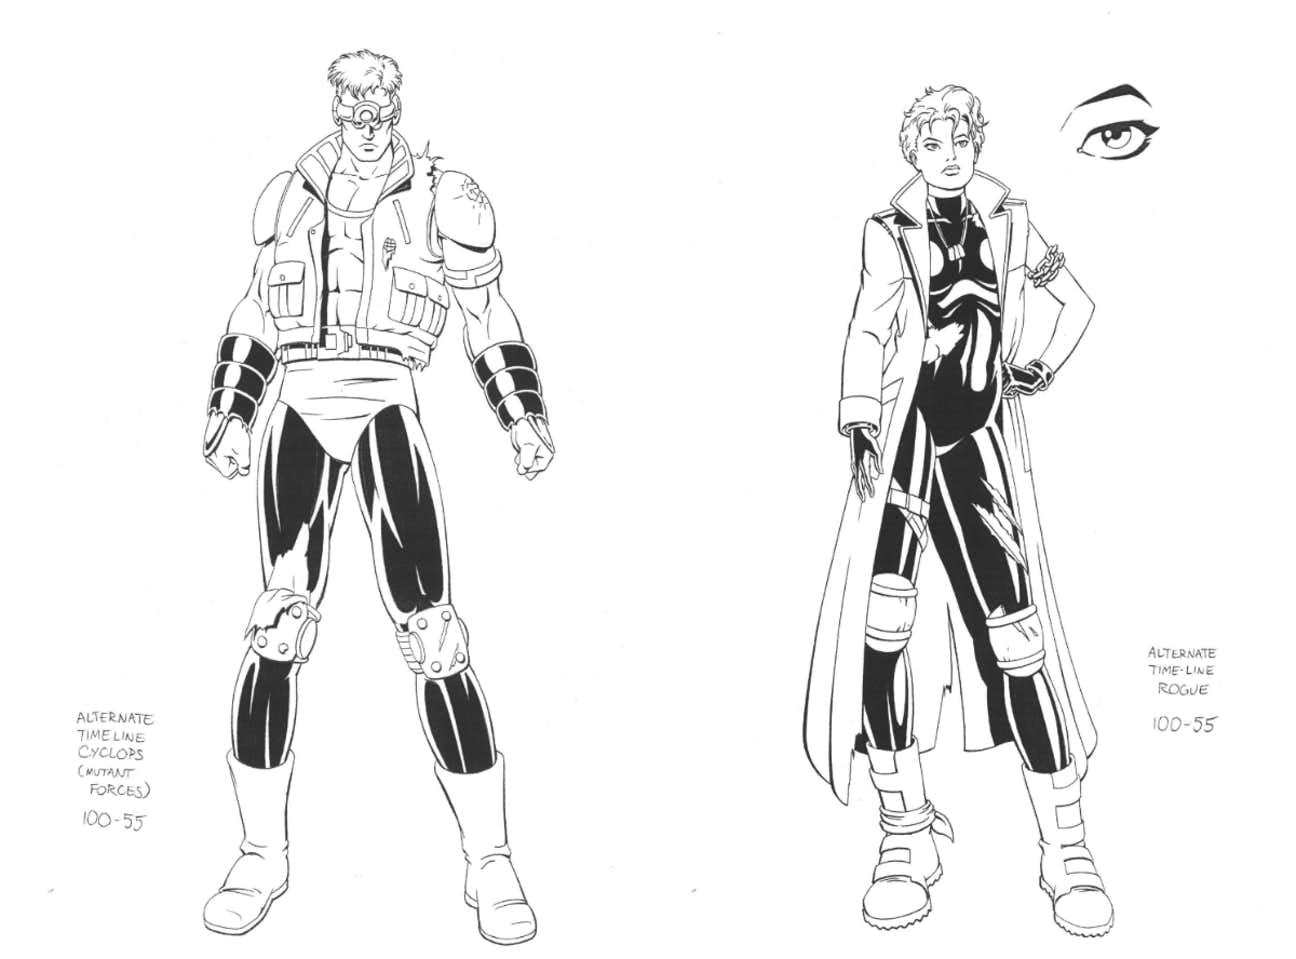 Cyclops-Rogue-Alternate-Timeline-XMen-Animated